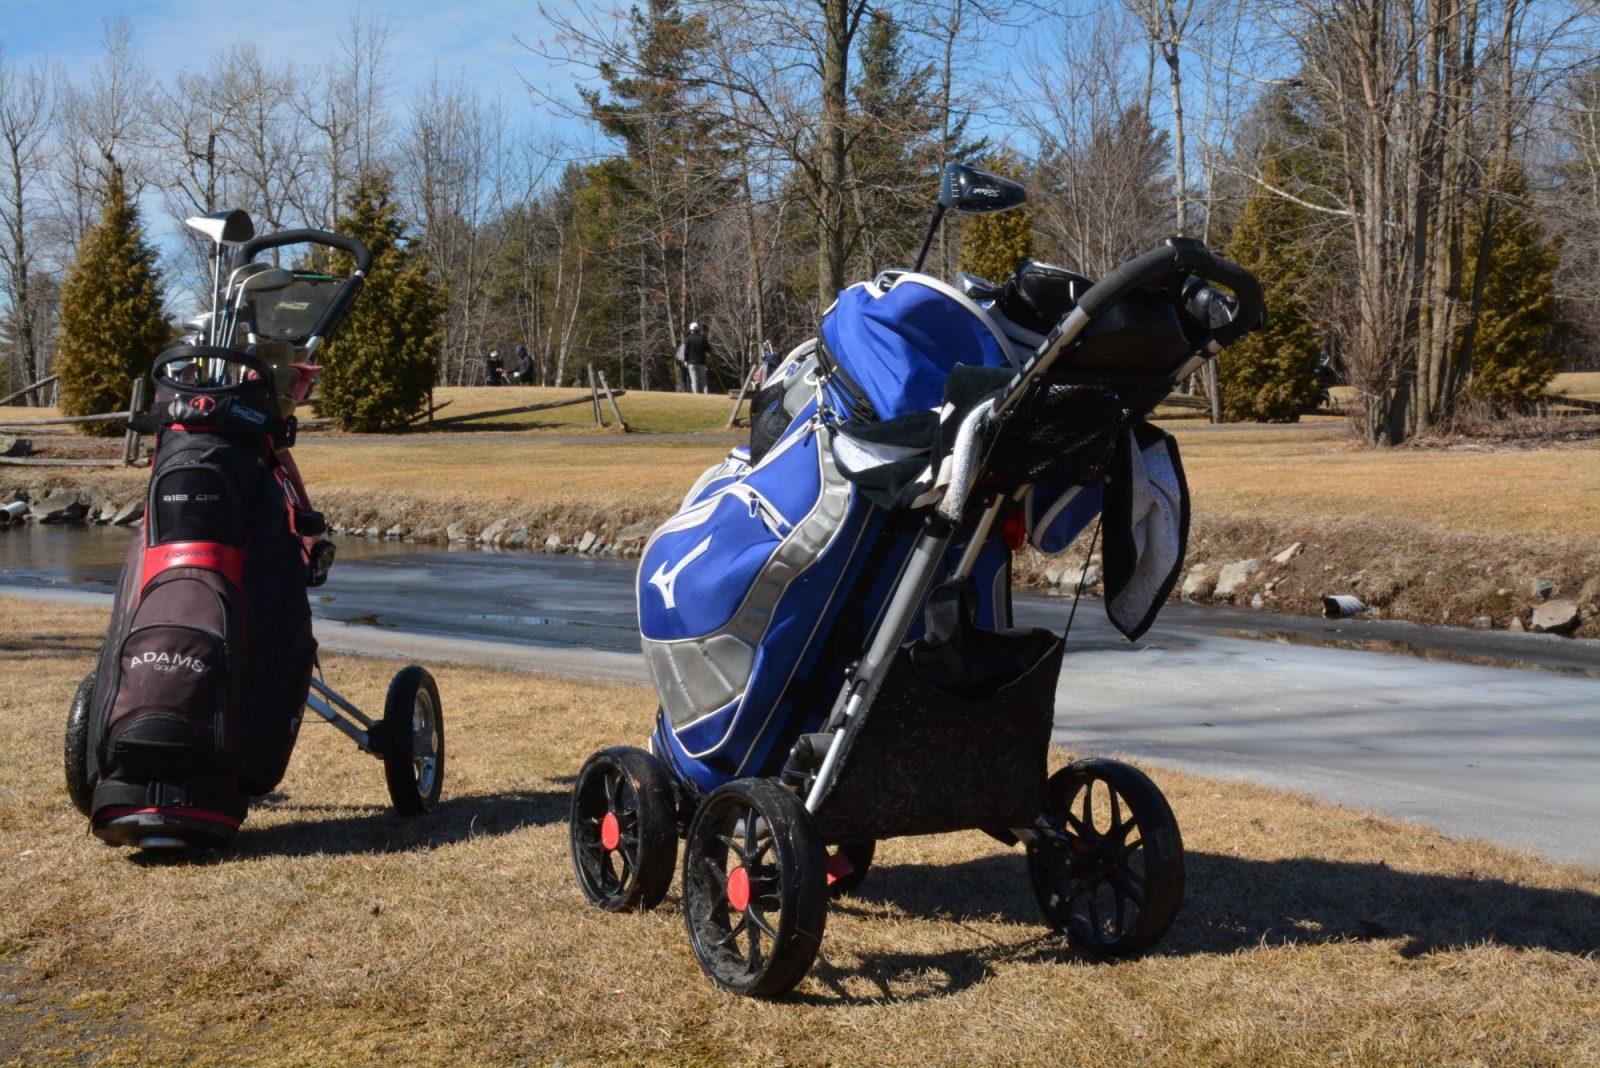 La saison de golf prend son envol